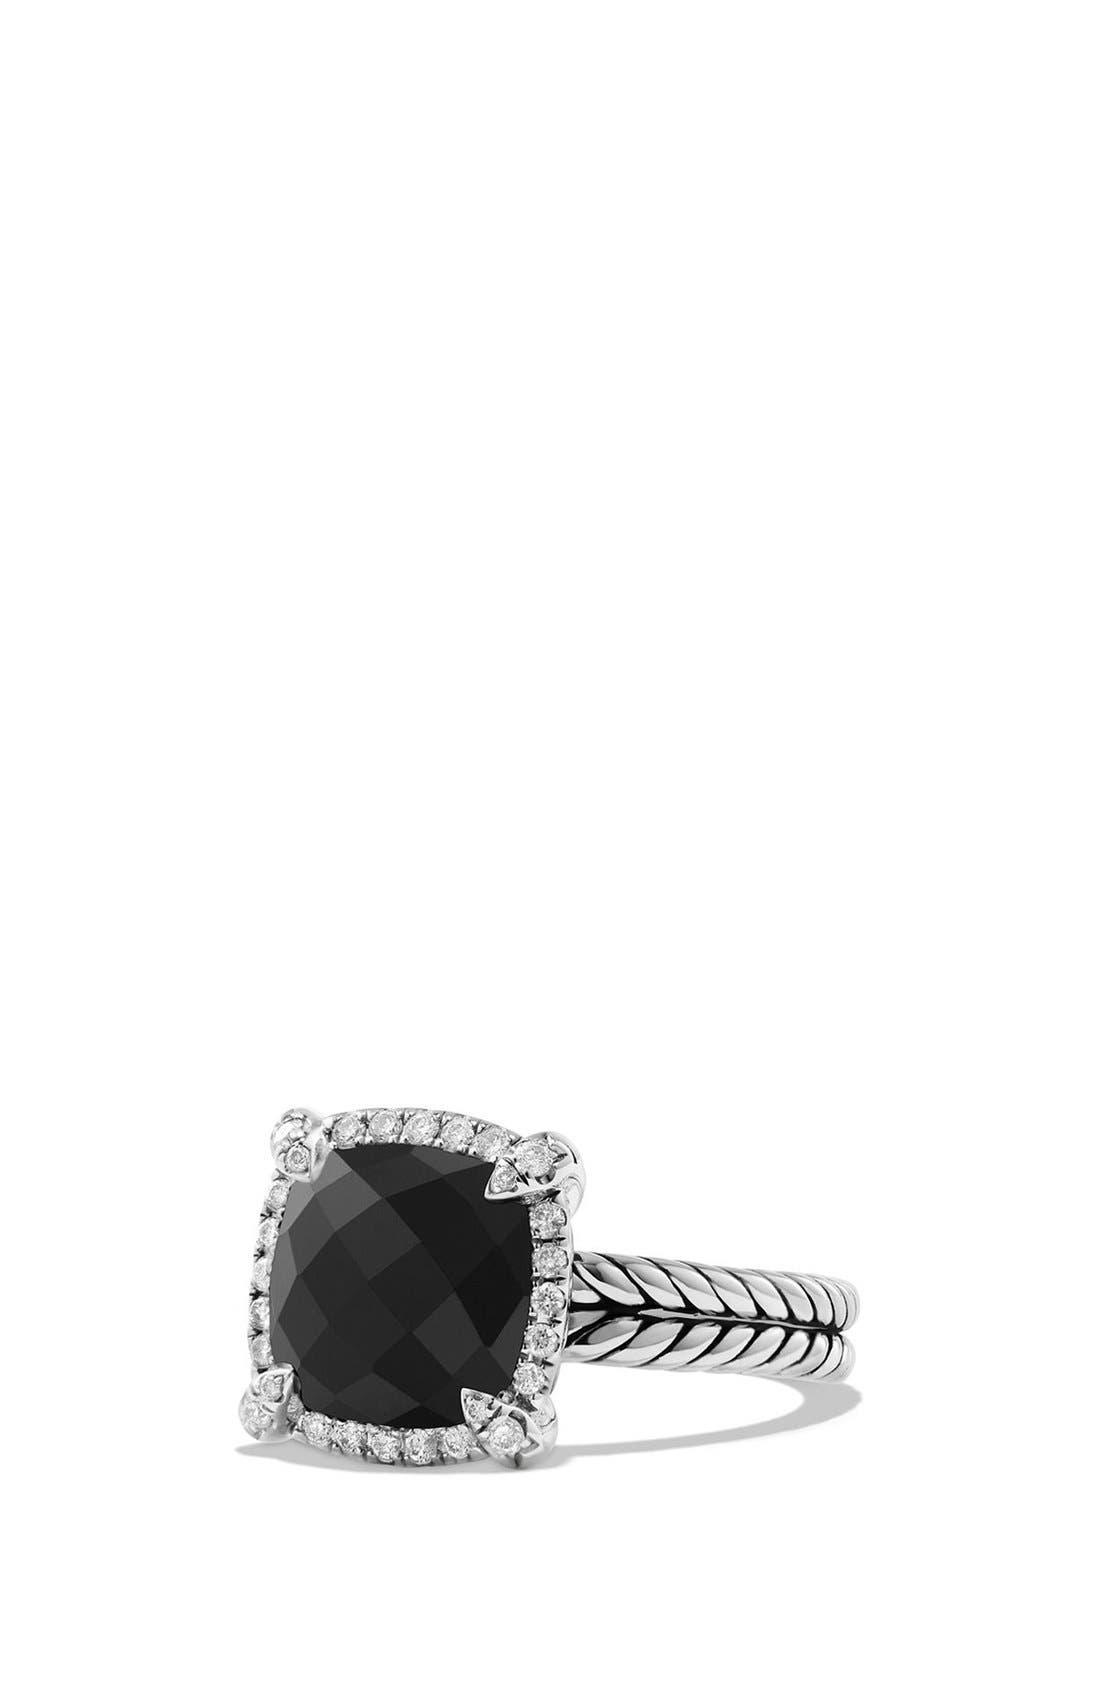 'Châtelaine' Small Pavé Bezel Ring with Diamonds,                         Main,                         color, BLACK ONYX